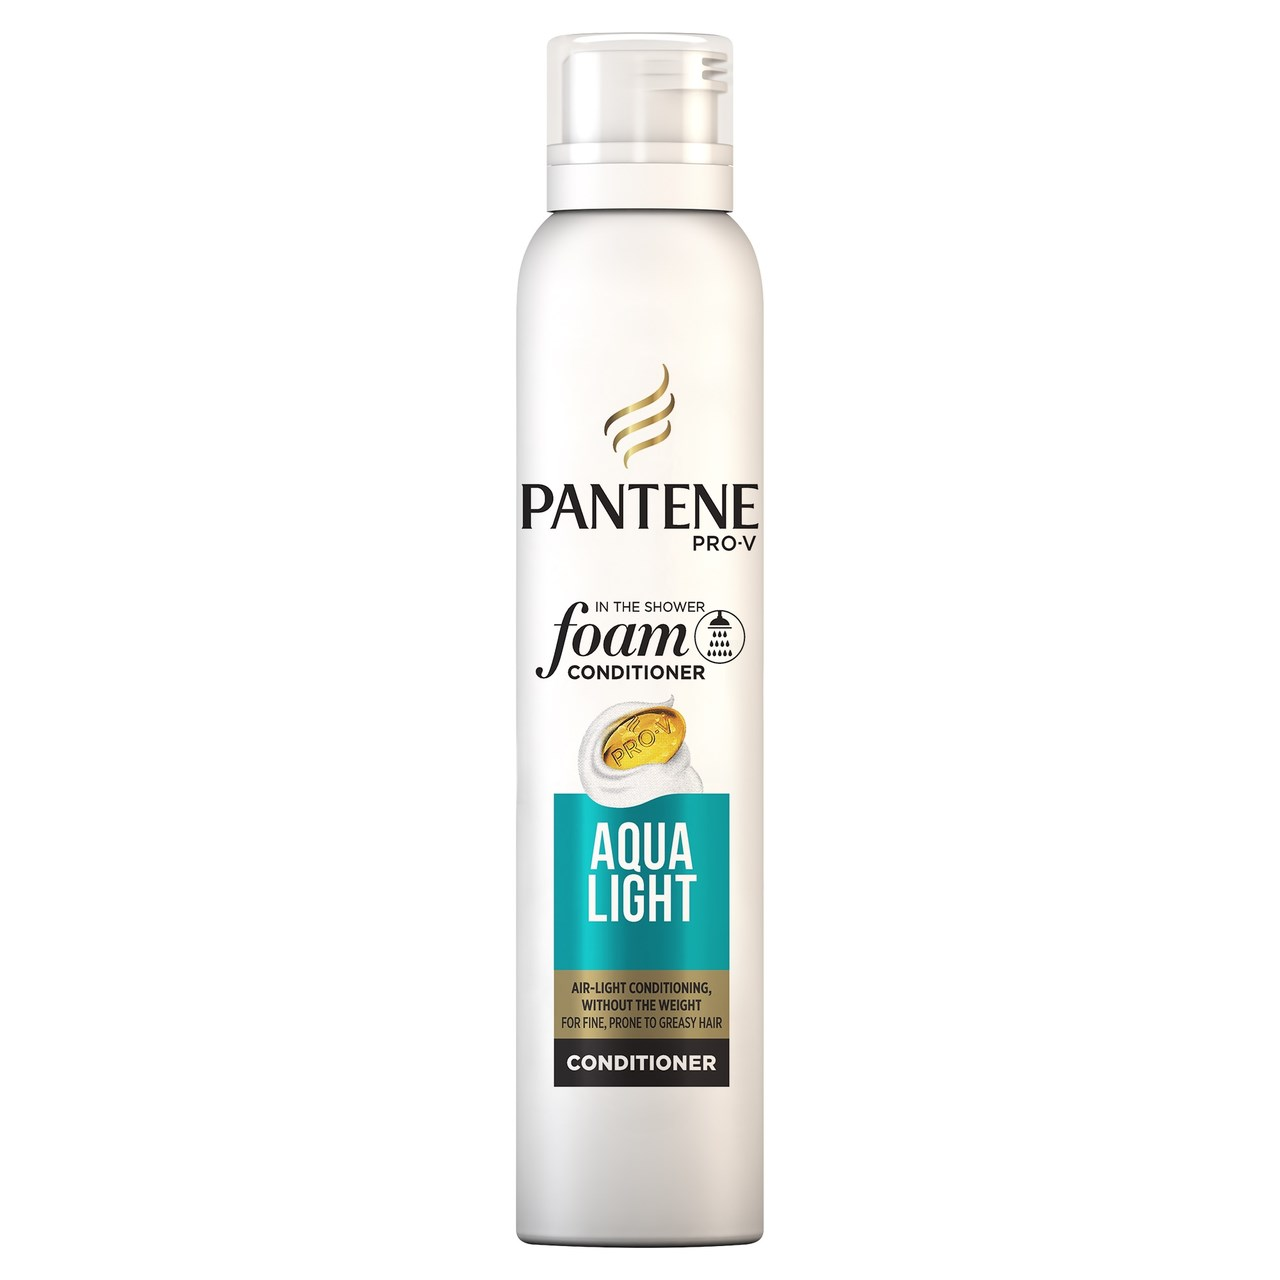 Pantene Pena na vlasy aqualight 1x180 ml